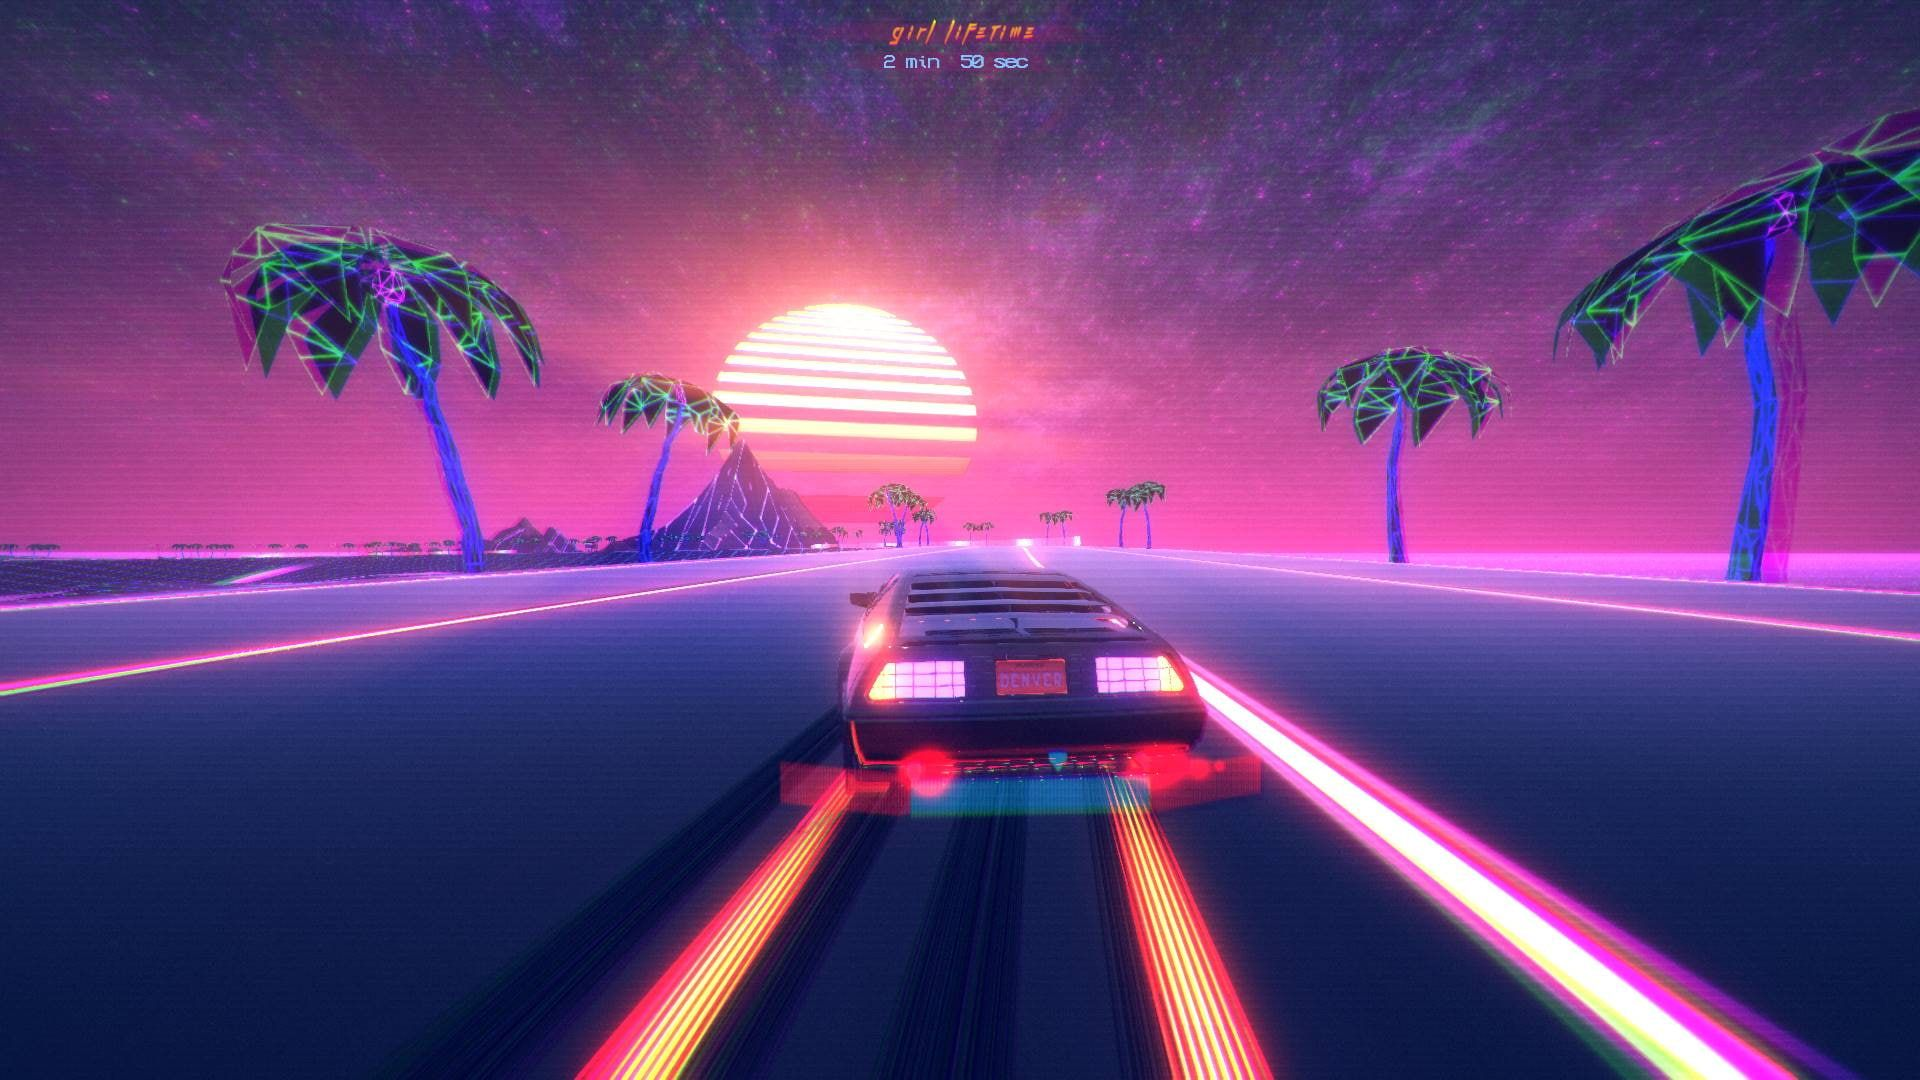 Video Game Outdrive Car Chillwave Neon Outrun Pink Retro Wave Retrowave Vaporwave 1080p Wallpaper Hdwallpa Vaporwave Wallpaper Retro Waves Vaporwave